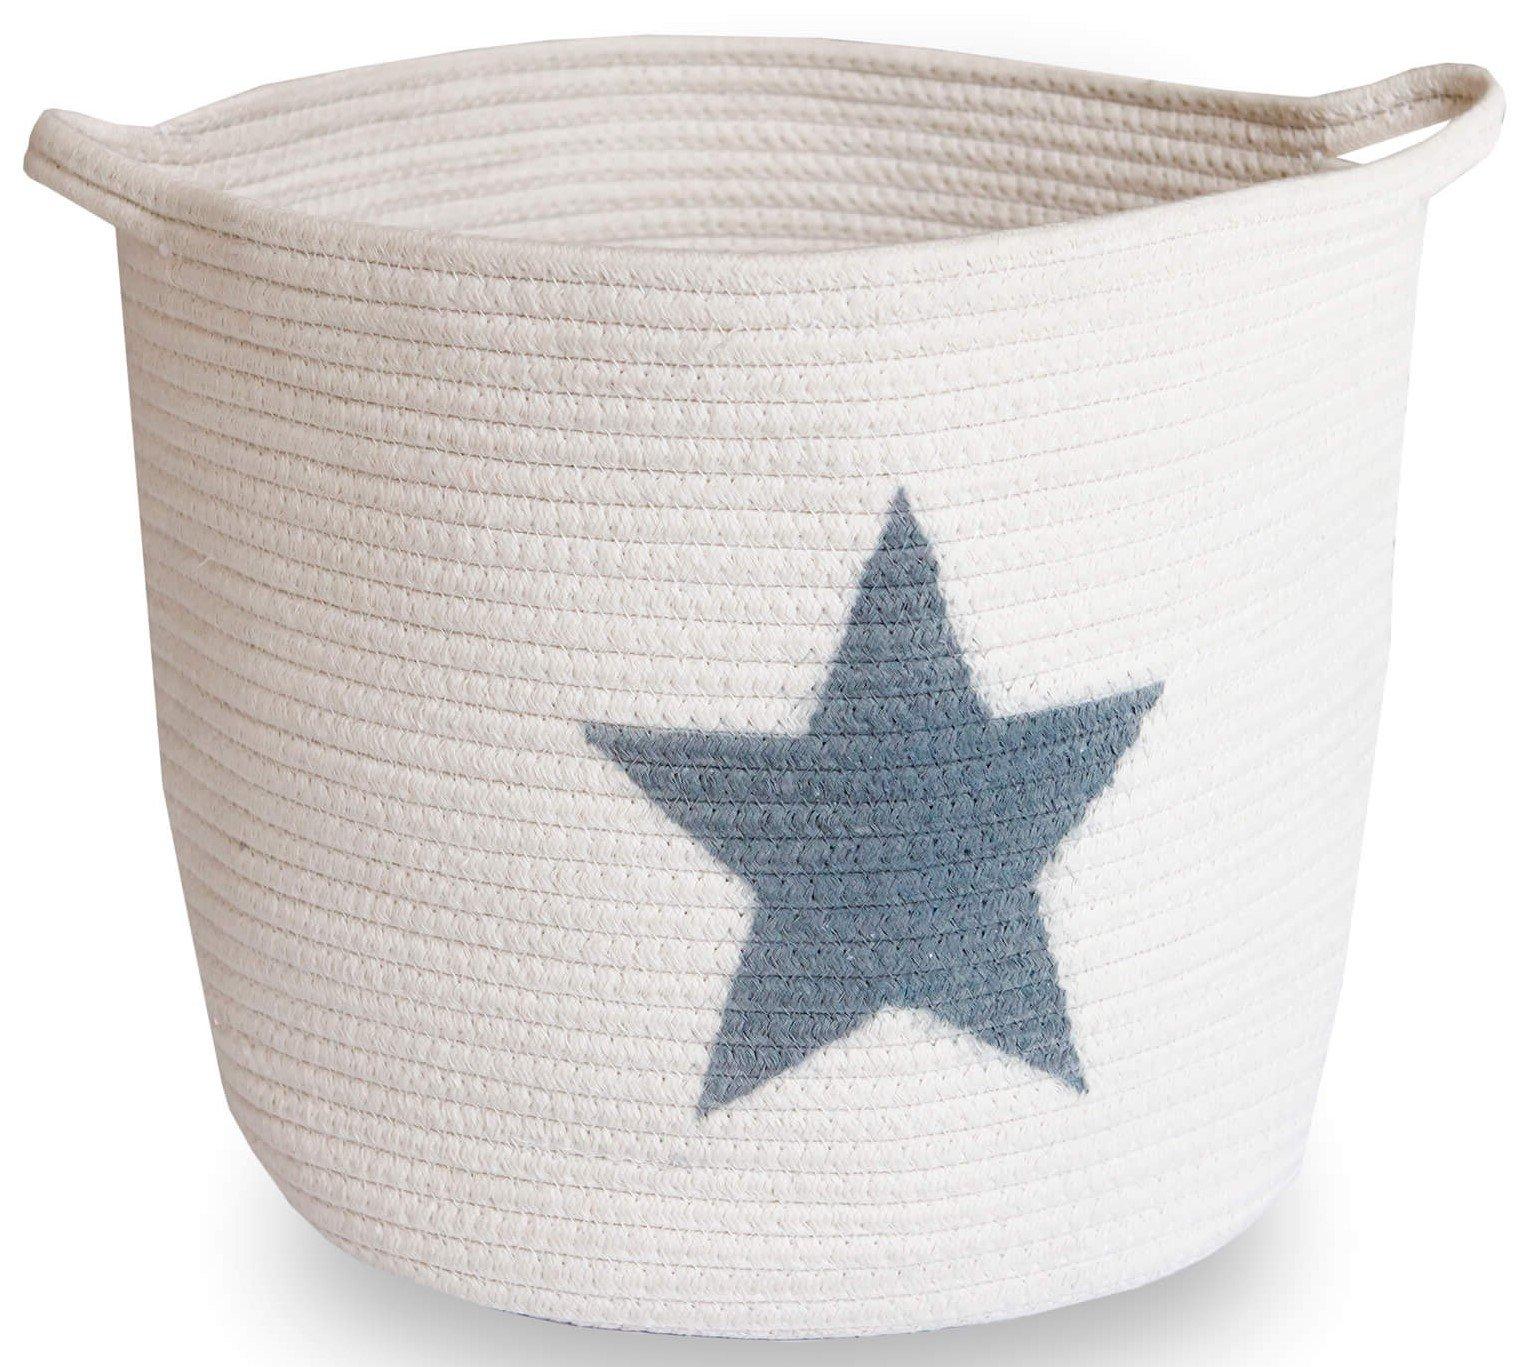 Toy Basket, Storage Baskets, Cotton Rope Large Woven Storage Basket, Blanket, Laundry Basket, Towel Storage, 15x13 Baby Storage Bins, Stuffed Animal Storage, Storage Organizer, Nursery and Home Decor